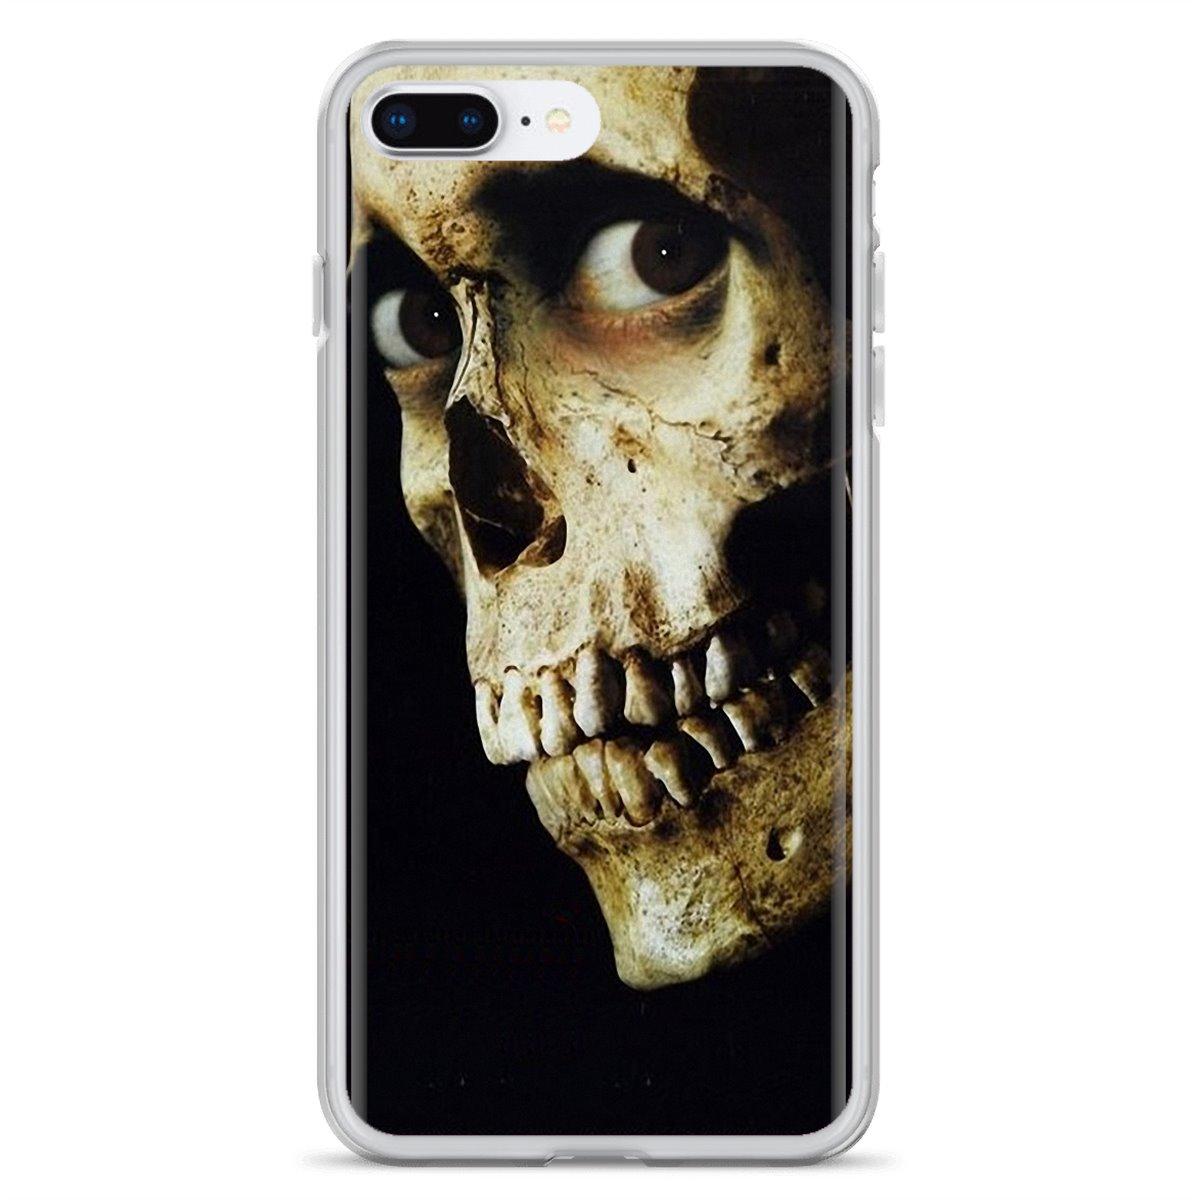 Satanic Skull Buy Silicone Phone Case For Huawei Mate Honor 4C 5C 5X 6X 7 7A 7C 8 9 10 8C 8X 20 Lite Pro(China)